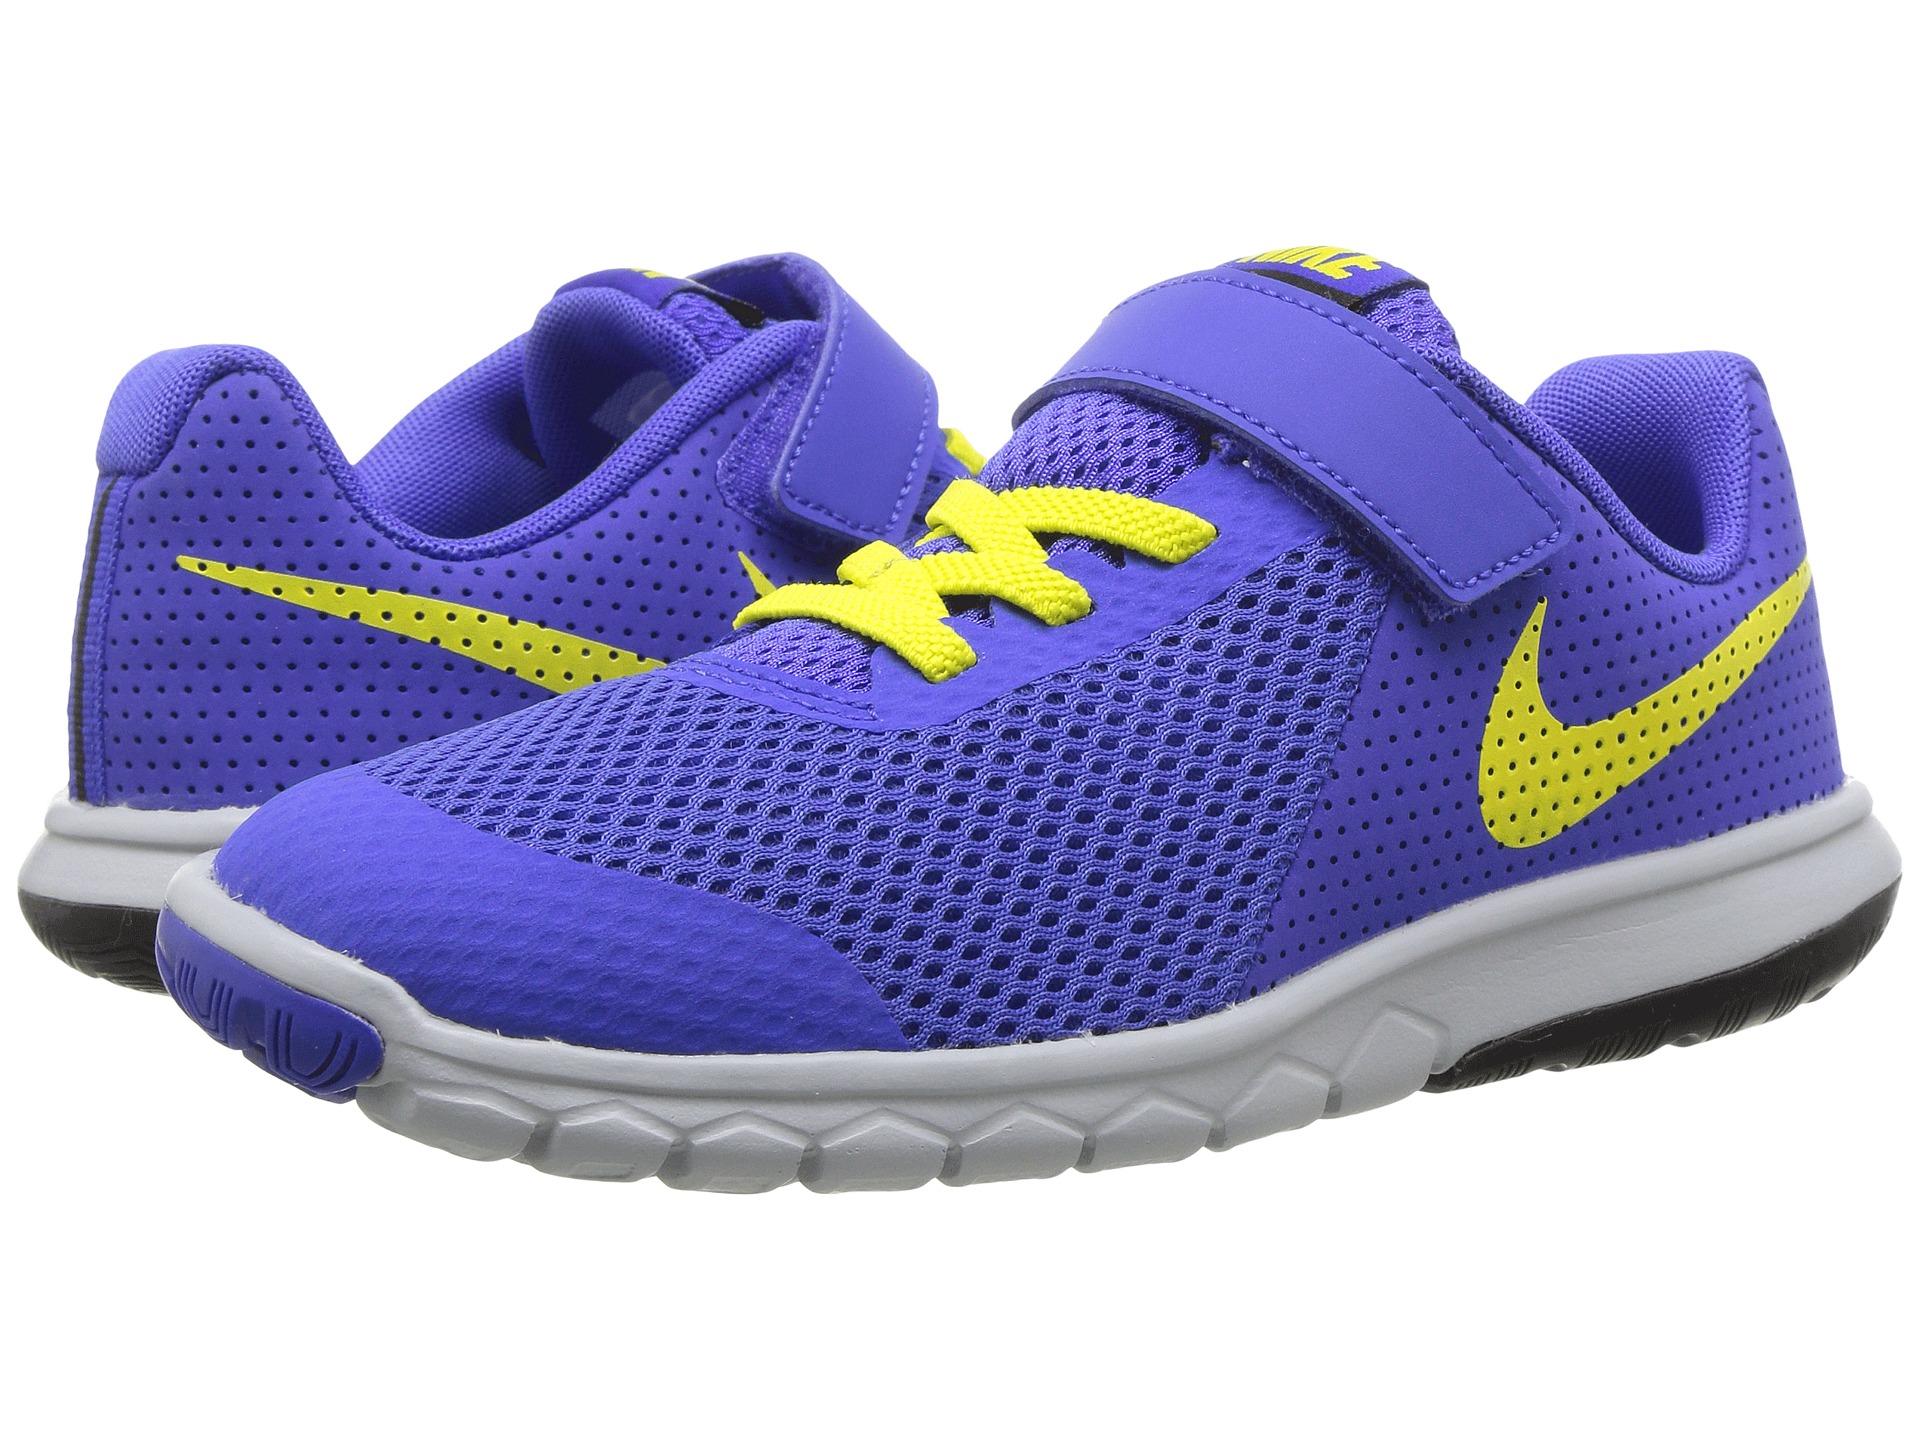 ed23a262880011 Nike Air Jordan 31 Supernova